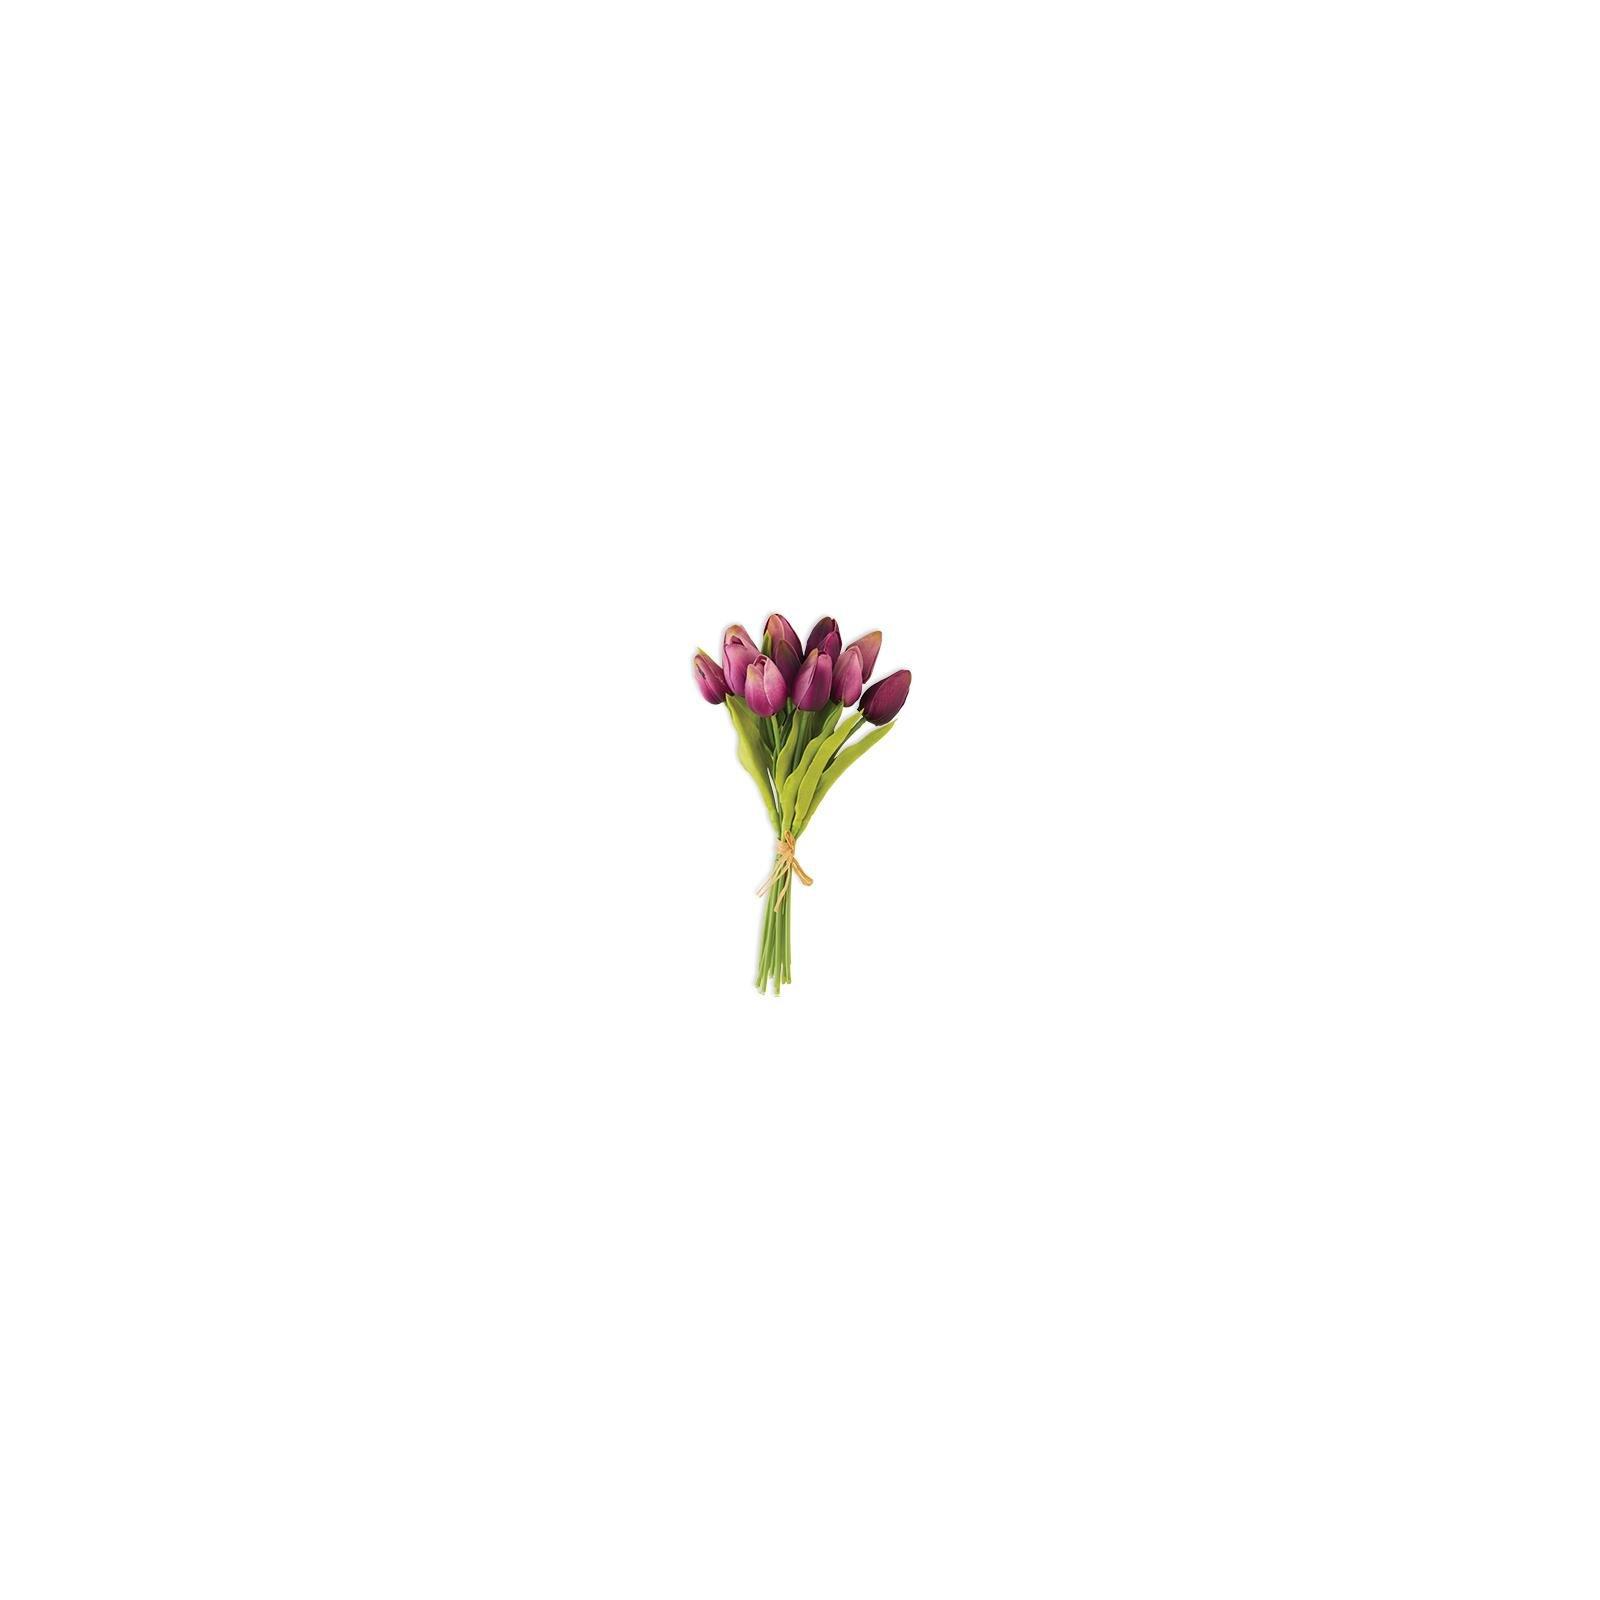 Mini Purp Tulip (Pack of 24) by K&K Interiors (Image #1)